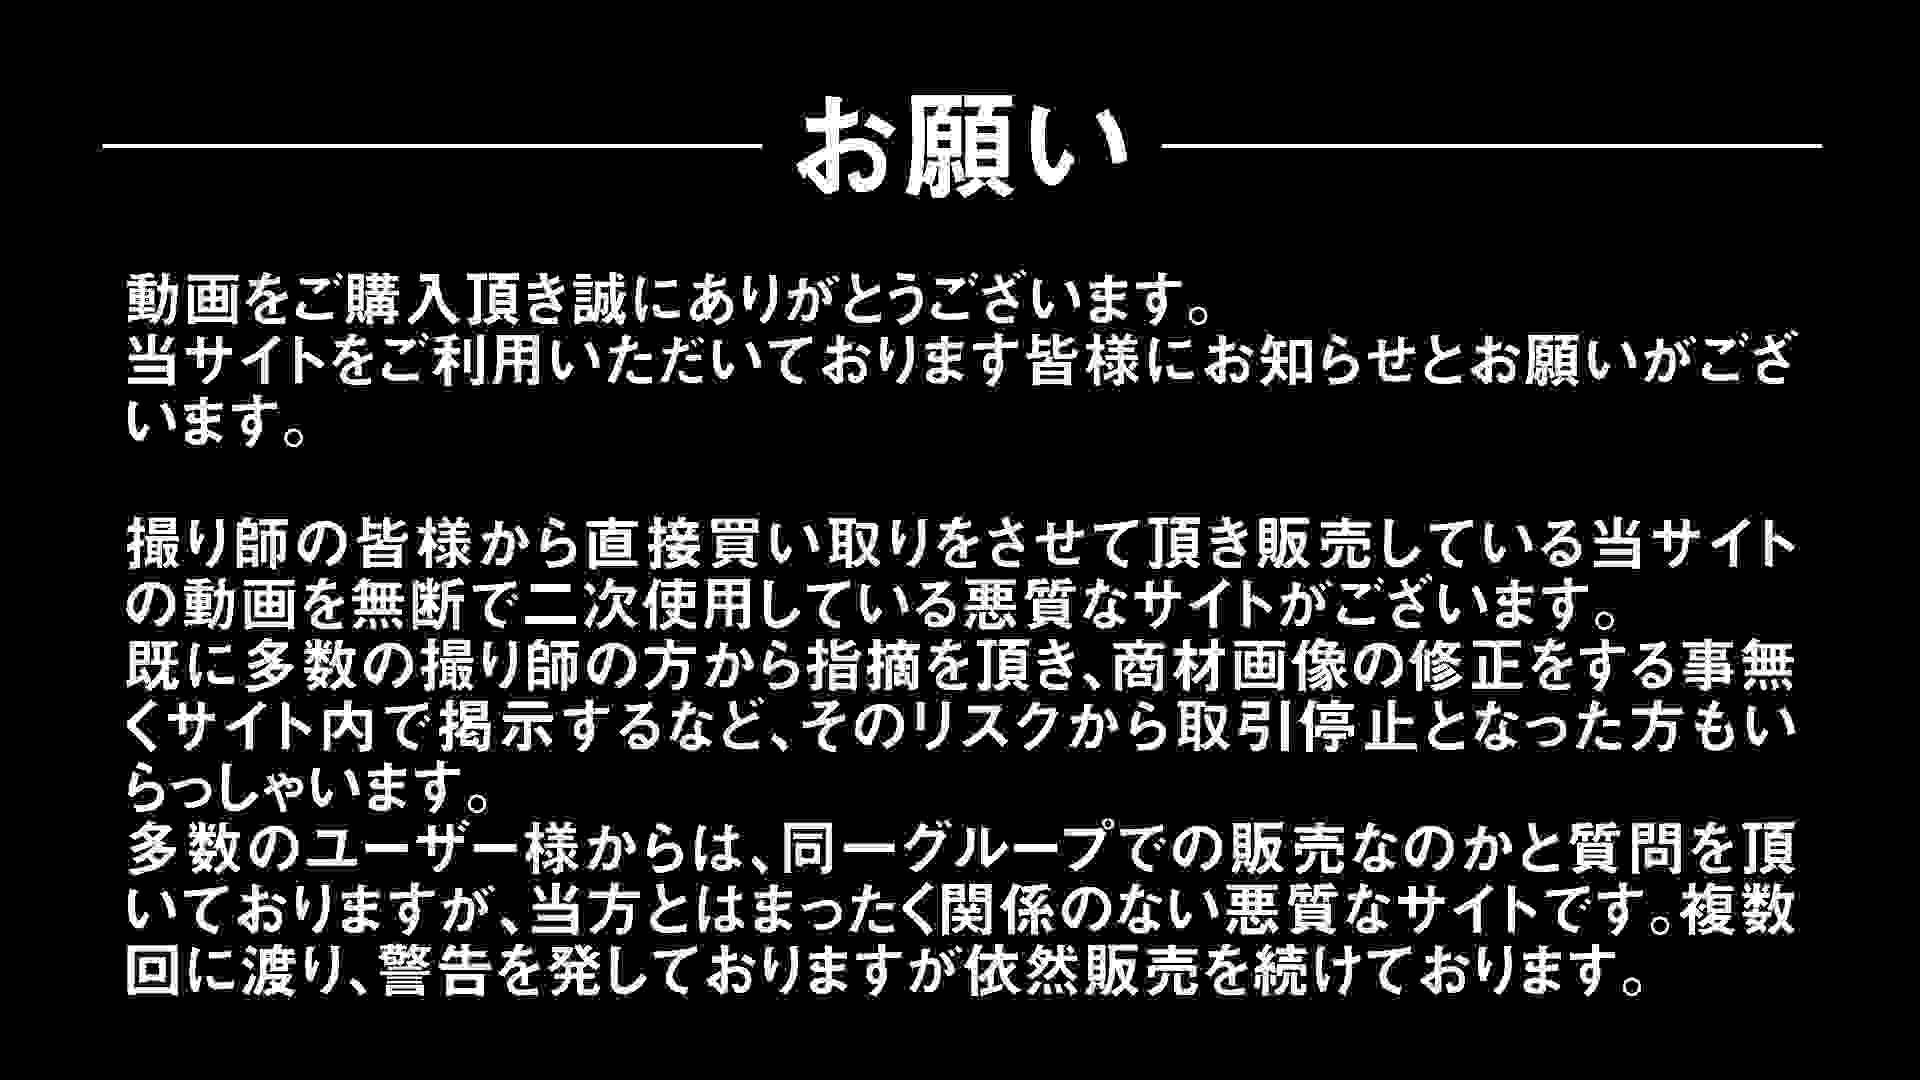 Aquaな露天風呂Vol.302 盗撮師作品  82pic 3